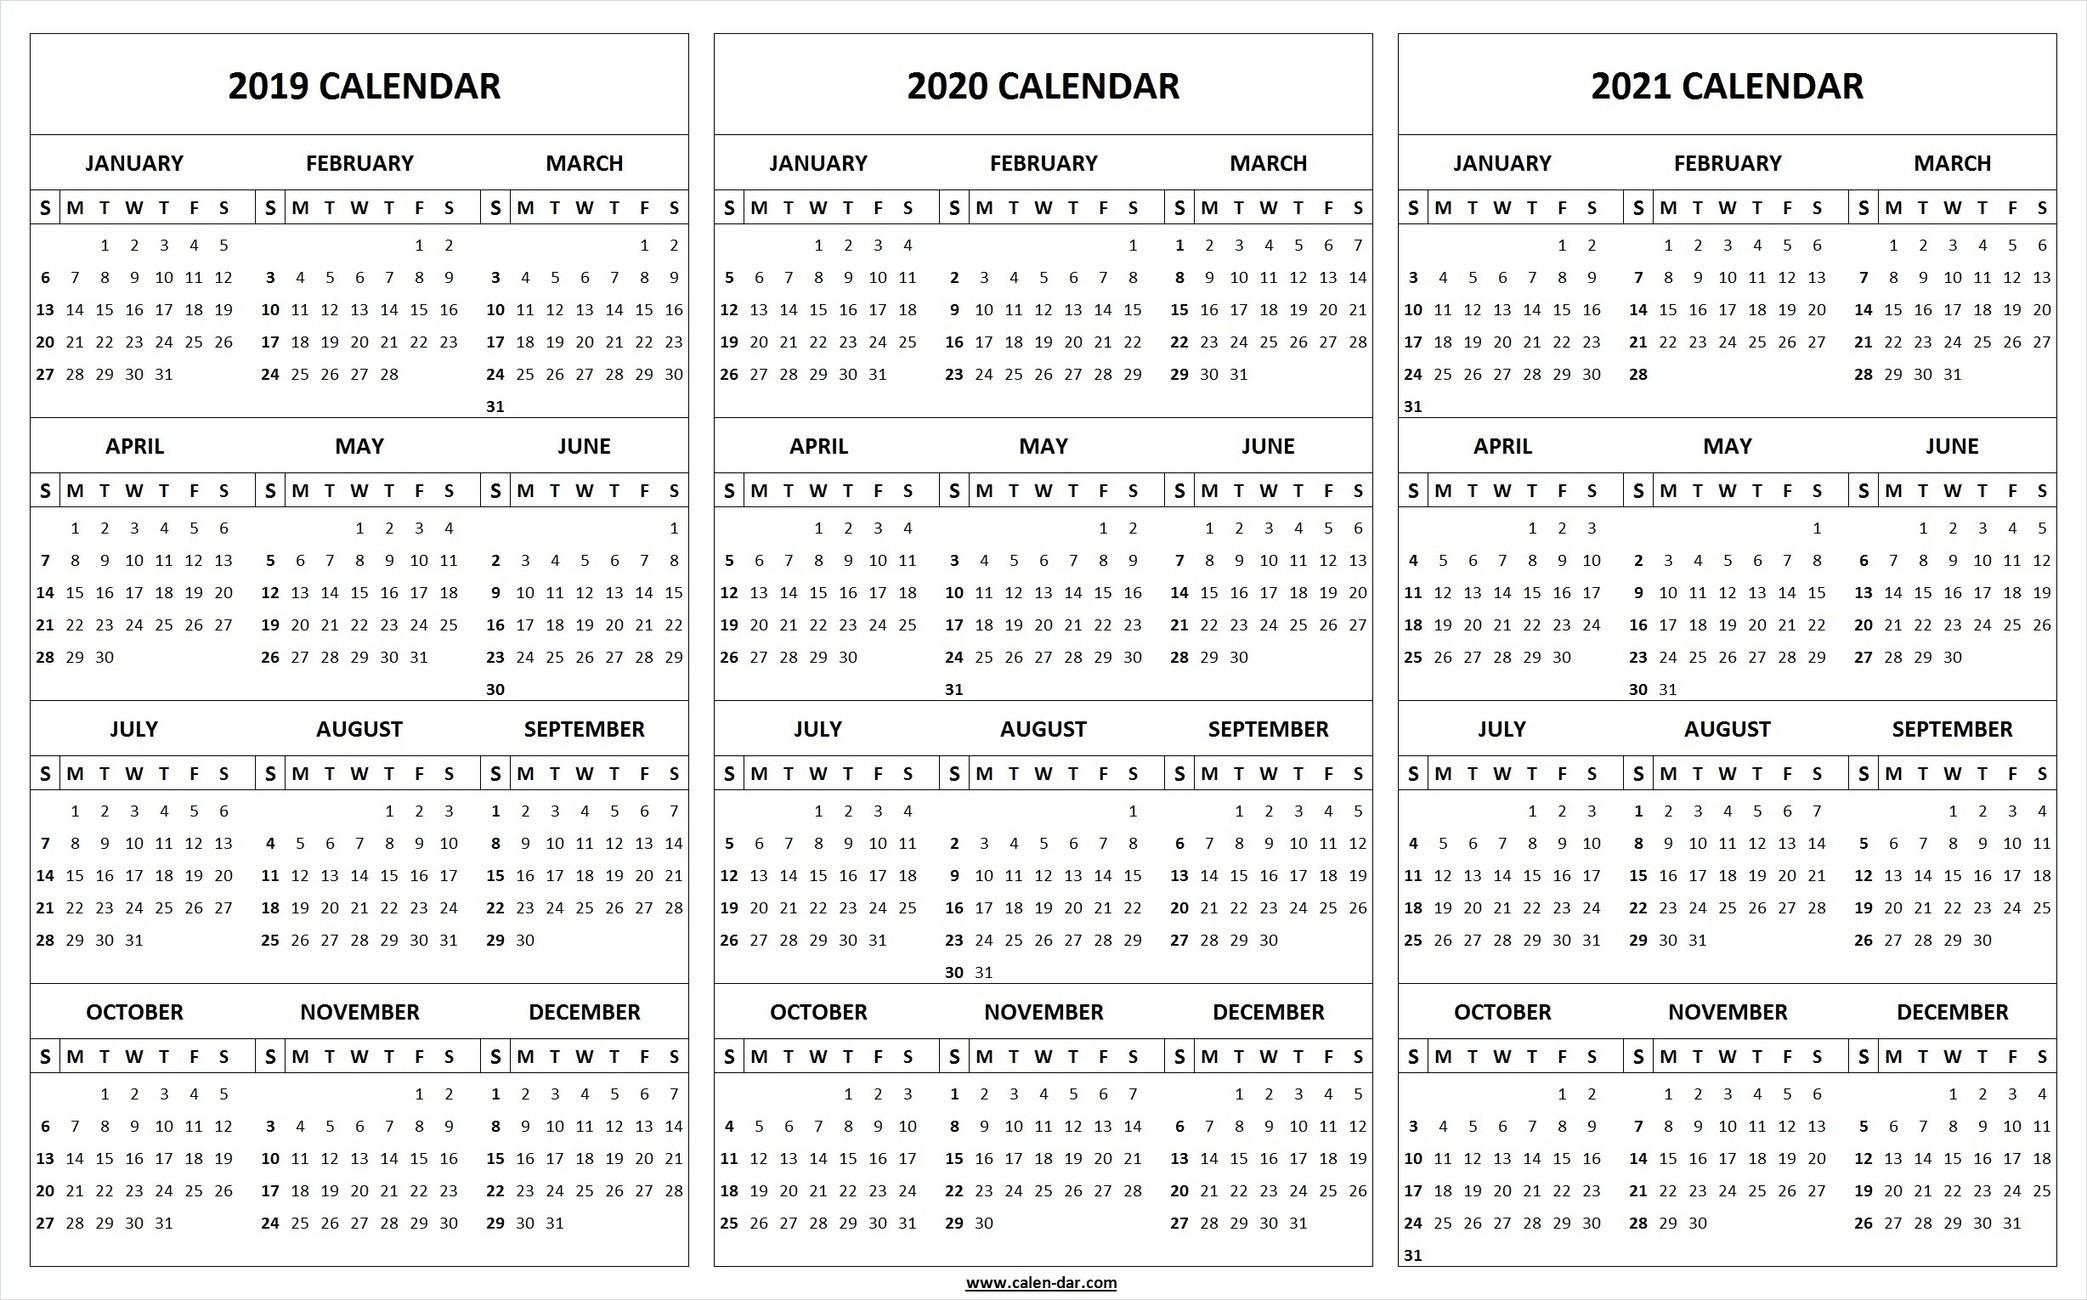 Calendario 2019 Para Imprimir Mes A Mes Más Recientemente Liberado Printable 2019 2020 2021 Calendar Template Of Calendario 2019 Para Imprimir Mes A Mes Más Populares Calendário 2019